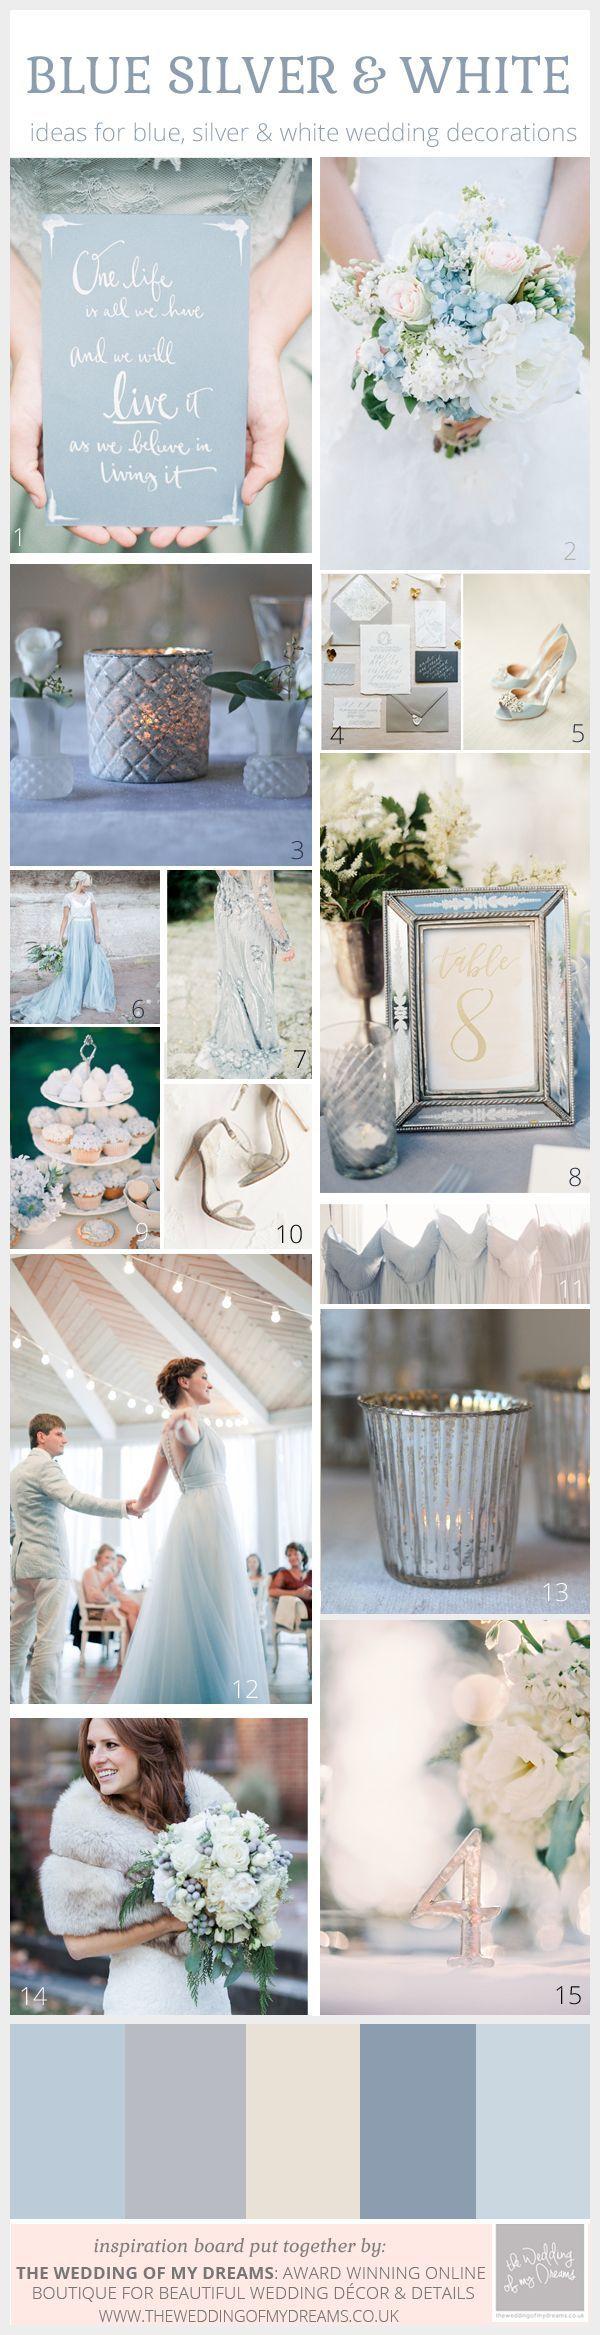 57 best Winter Wedding images on Pinterest   Winter weddings, Winter ...